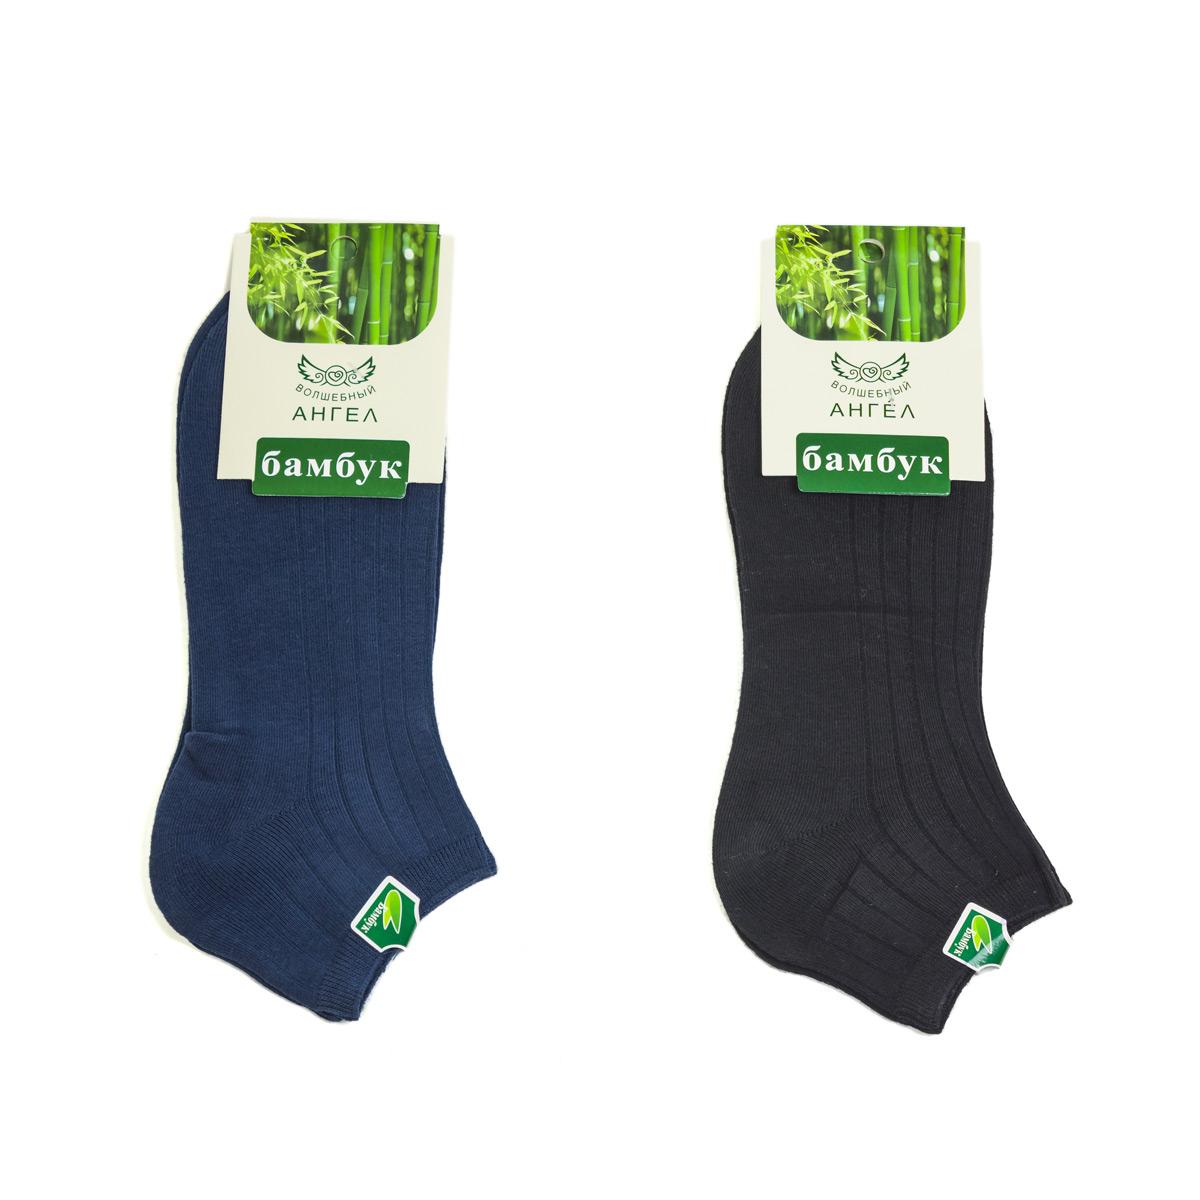 Муж. носки арт. 12-0125 Белый р. 42-48 rocawear ремень rocawear rw1227 черный